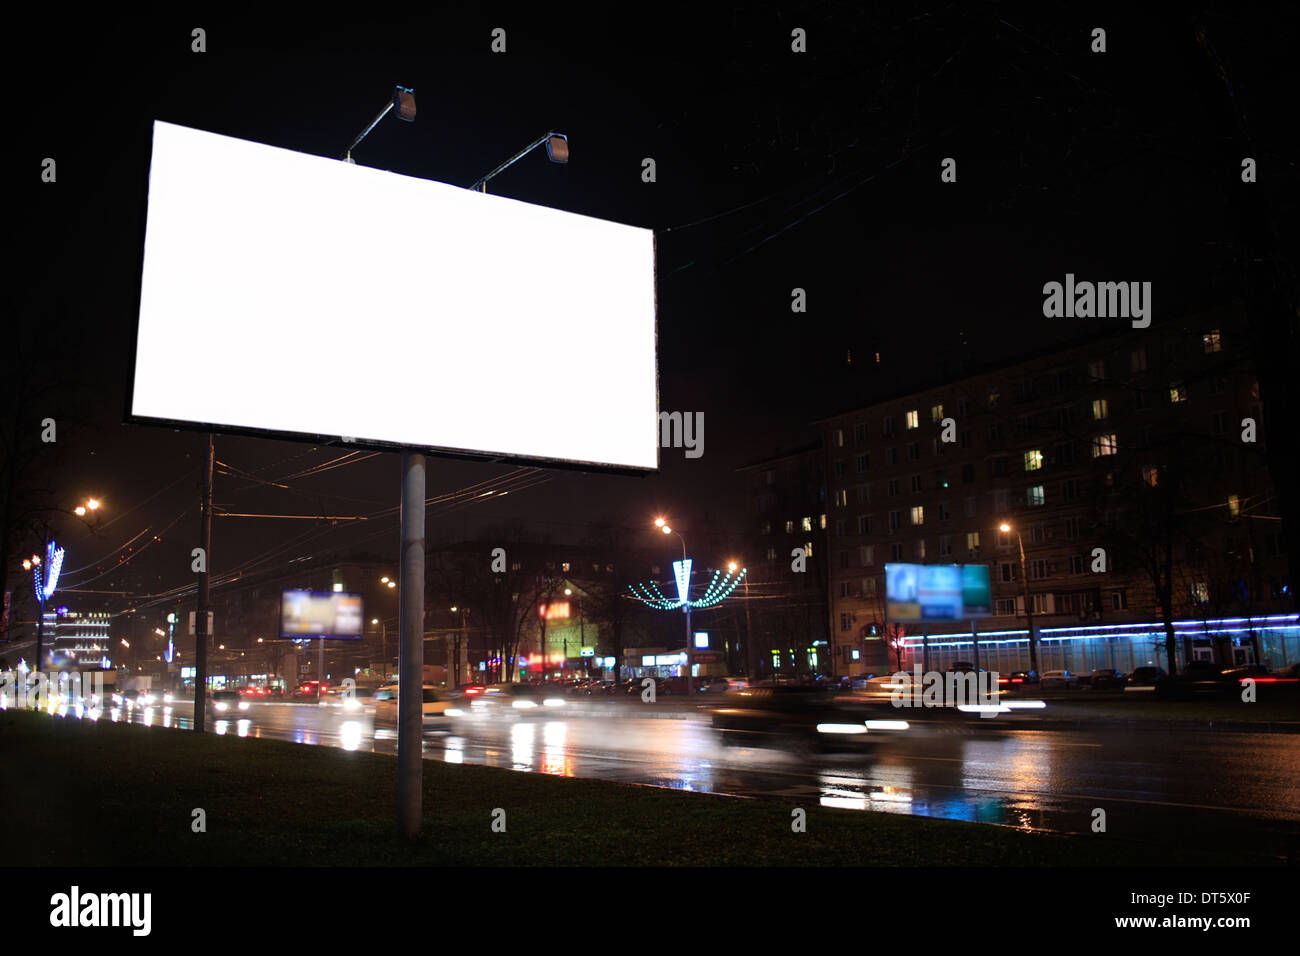 Empty billboard, by night - Stock Image